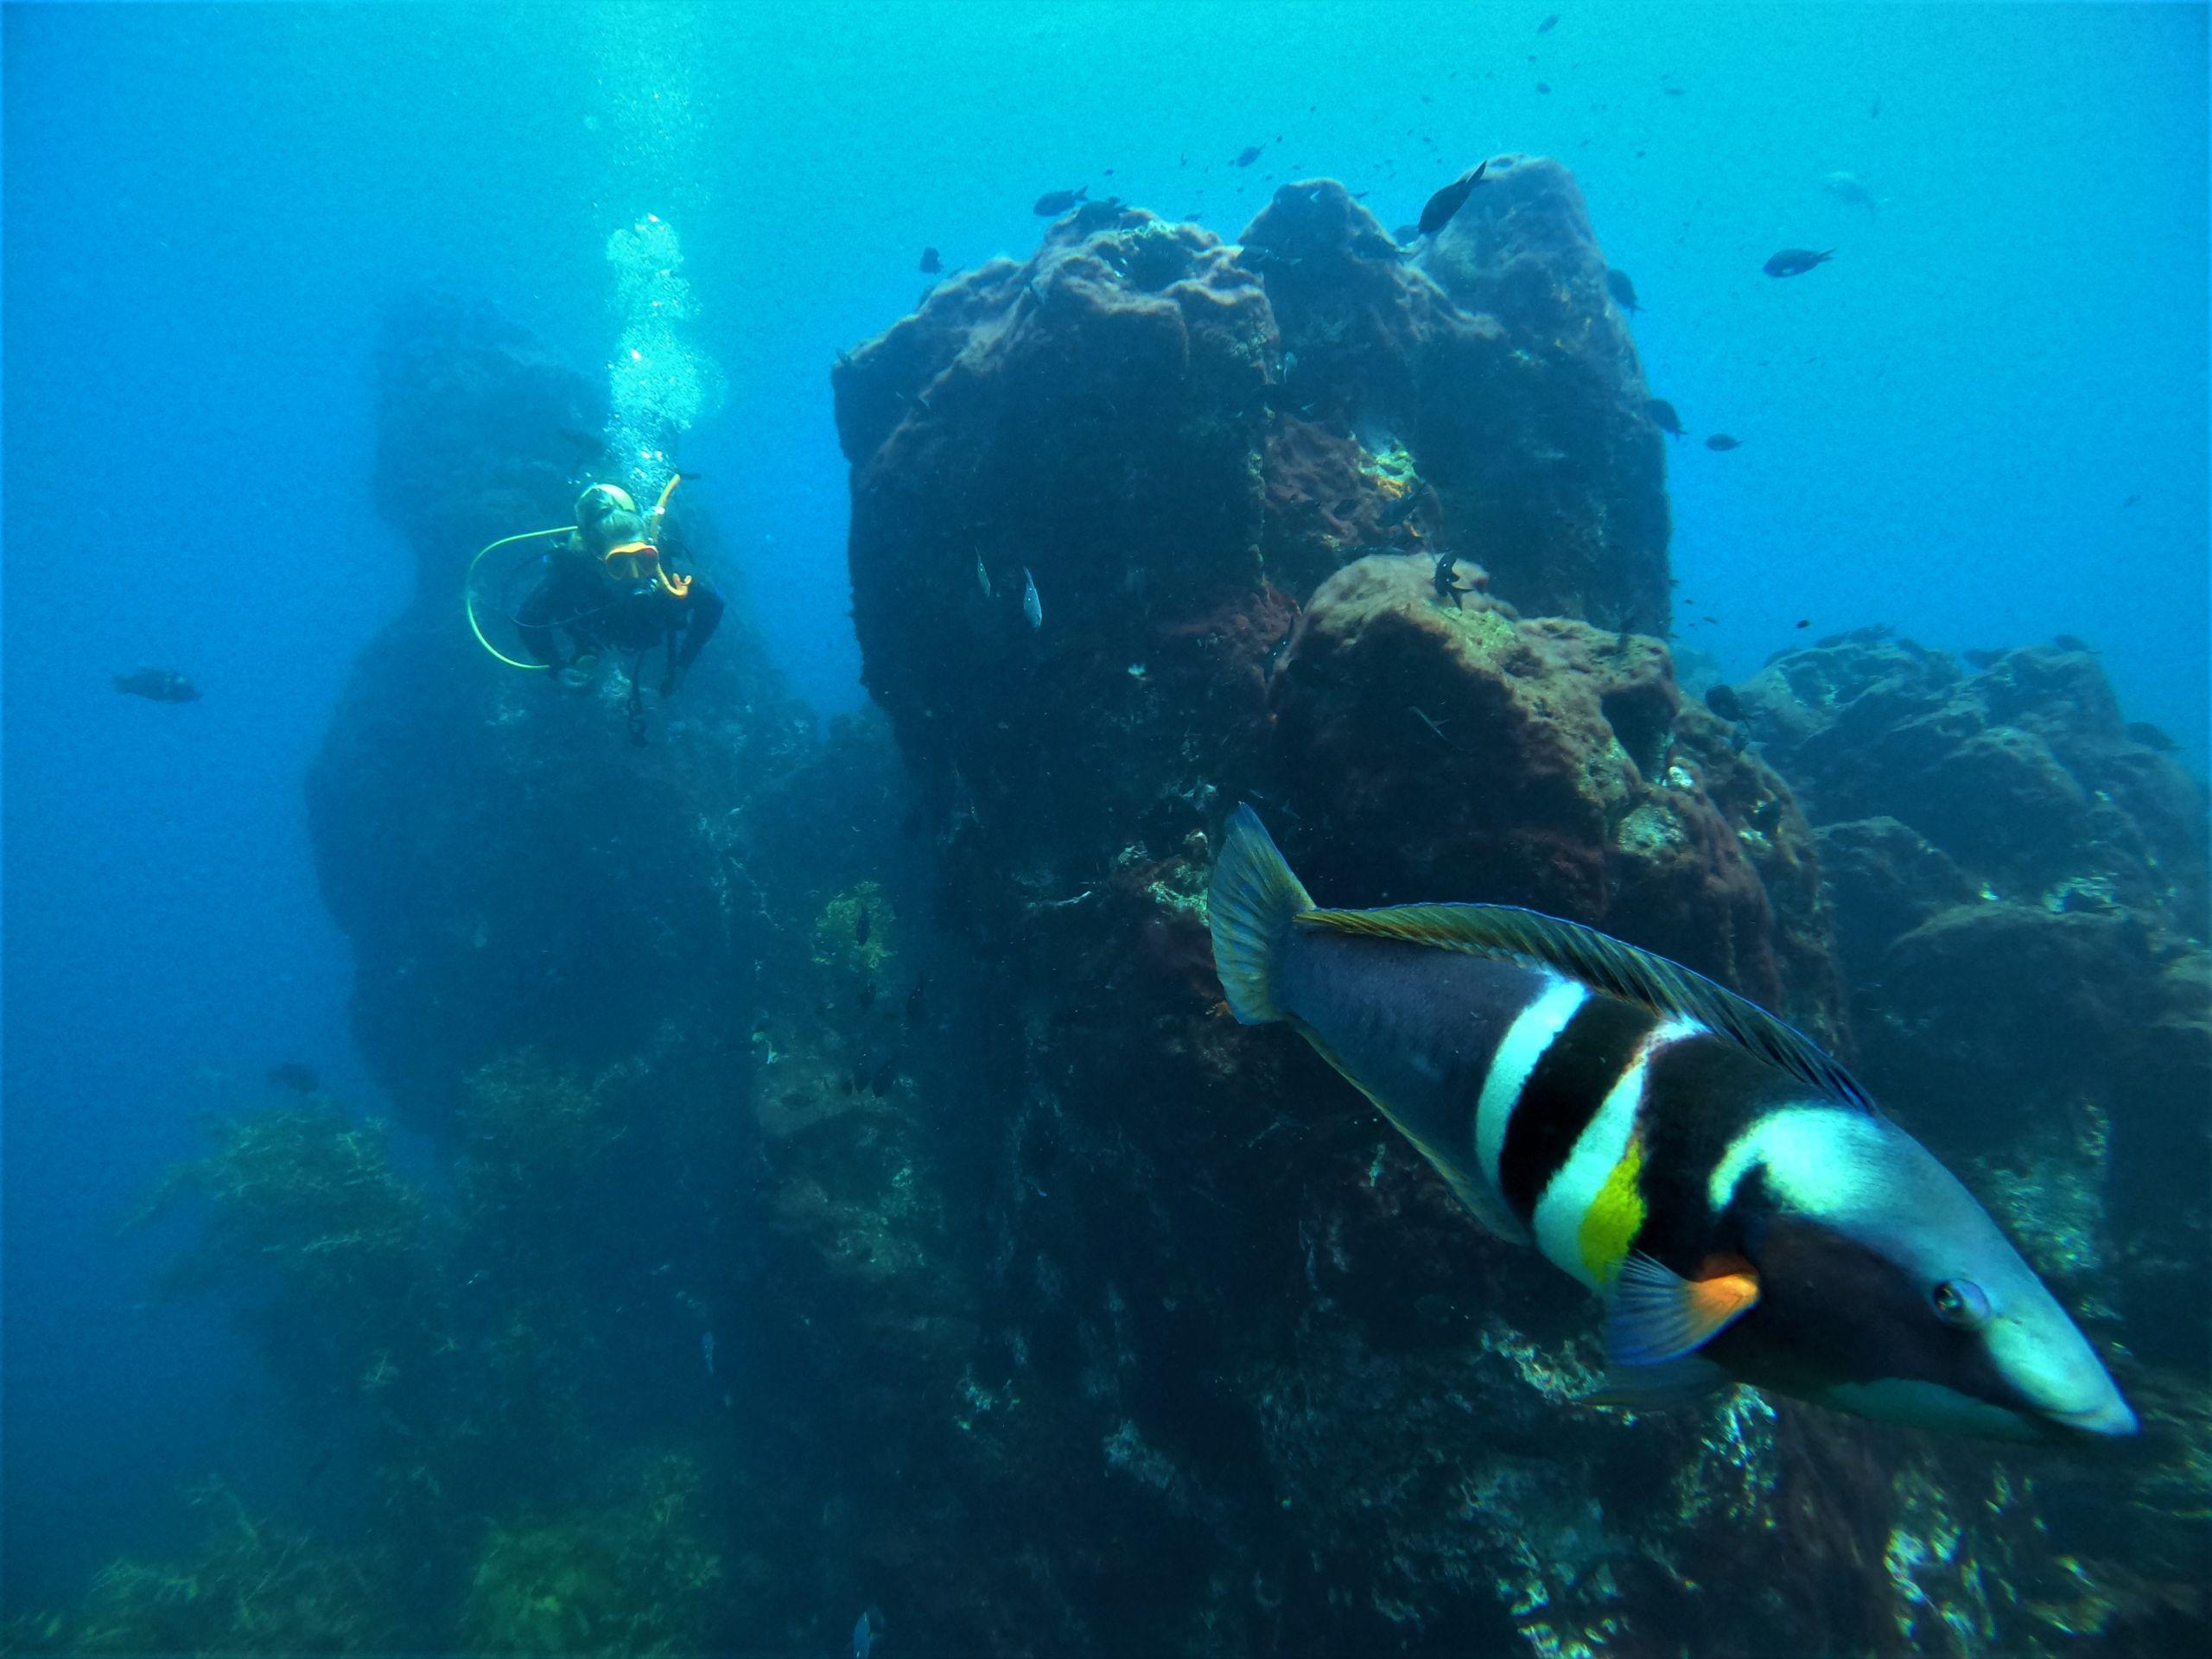 Scuba Diving the Eastern Coromandel